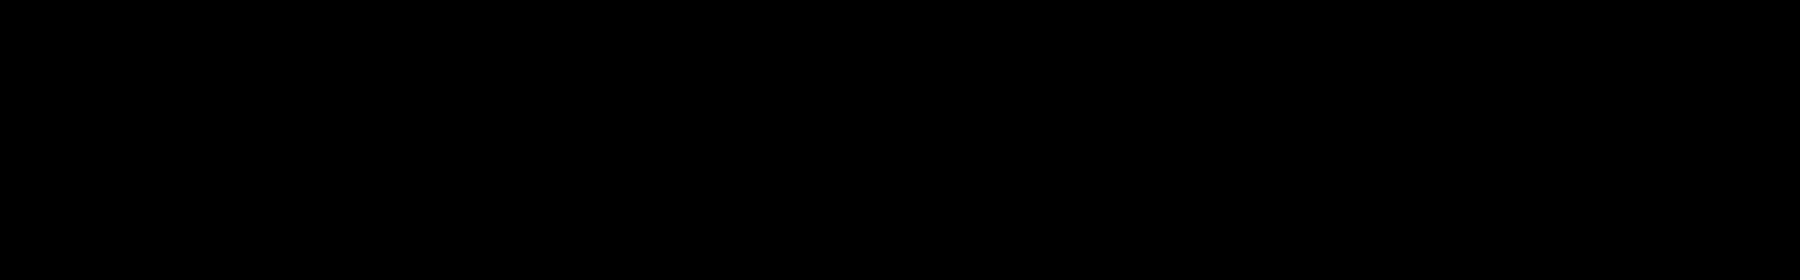 Torii 2 - Lofi Beats audio waveform